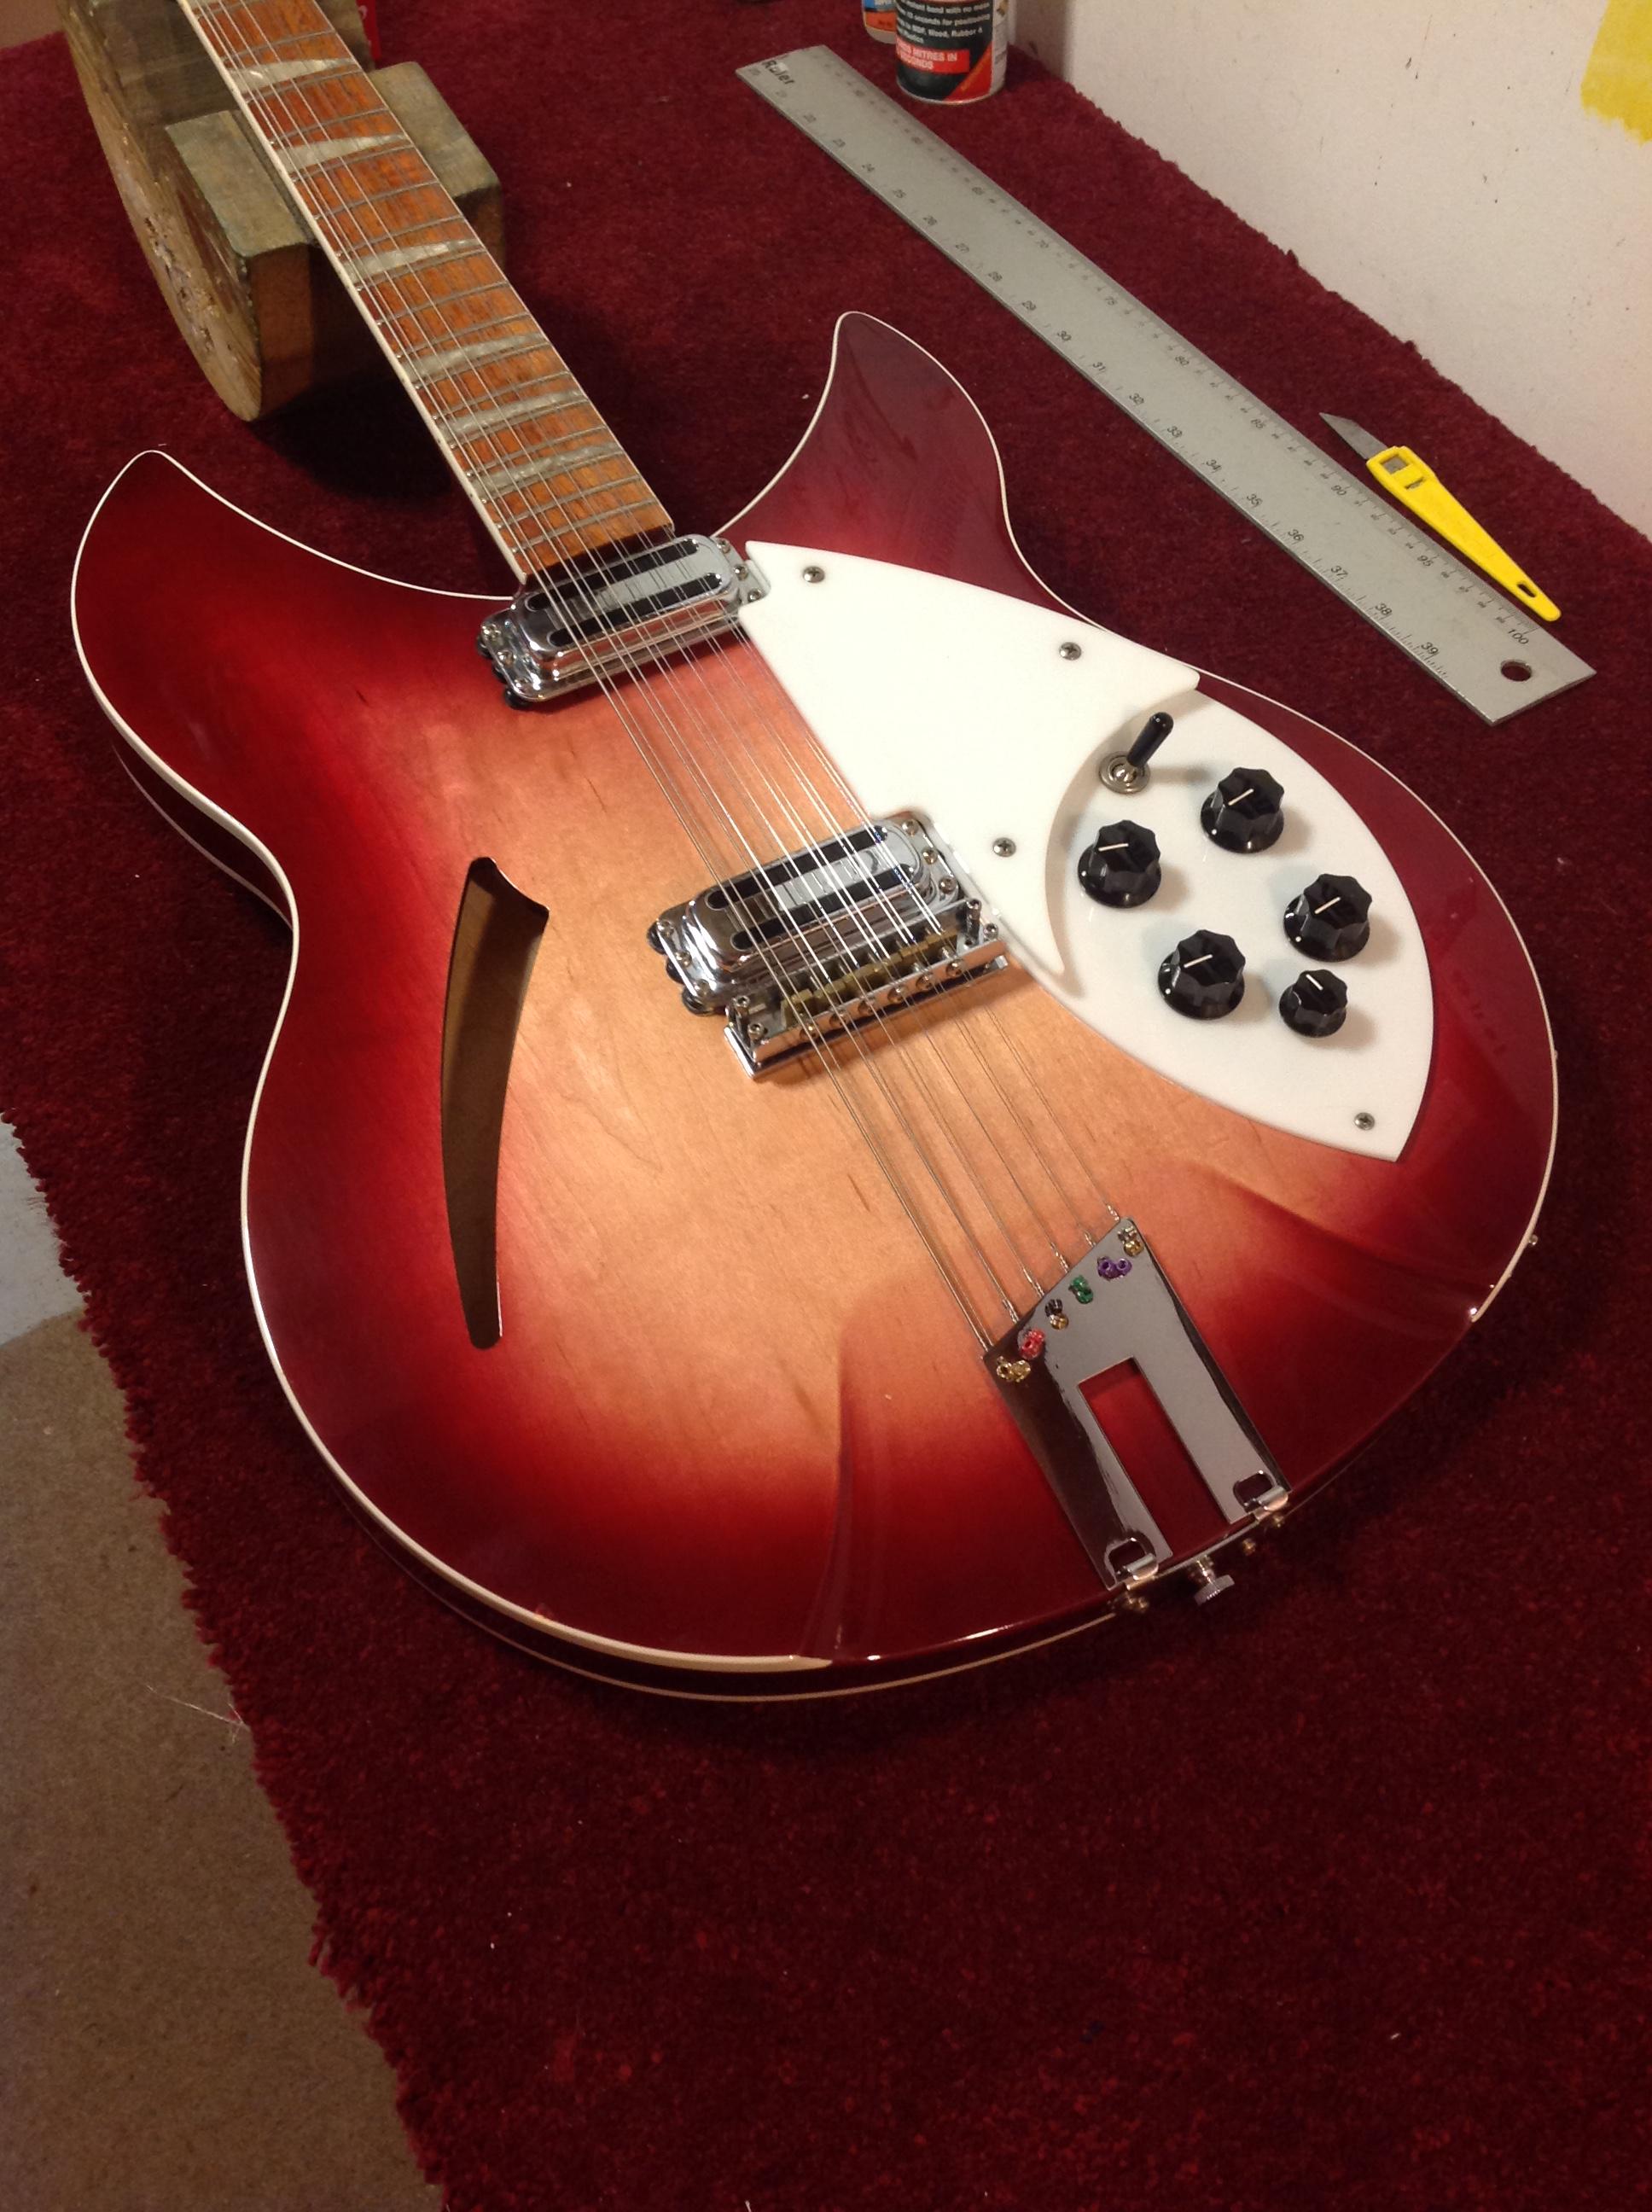 rickenbacker 330 12 fireglow 12 string john wesley guitar repairs. Black Bedroom Furniture Sets. Home Design Ideas